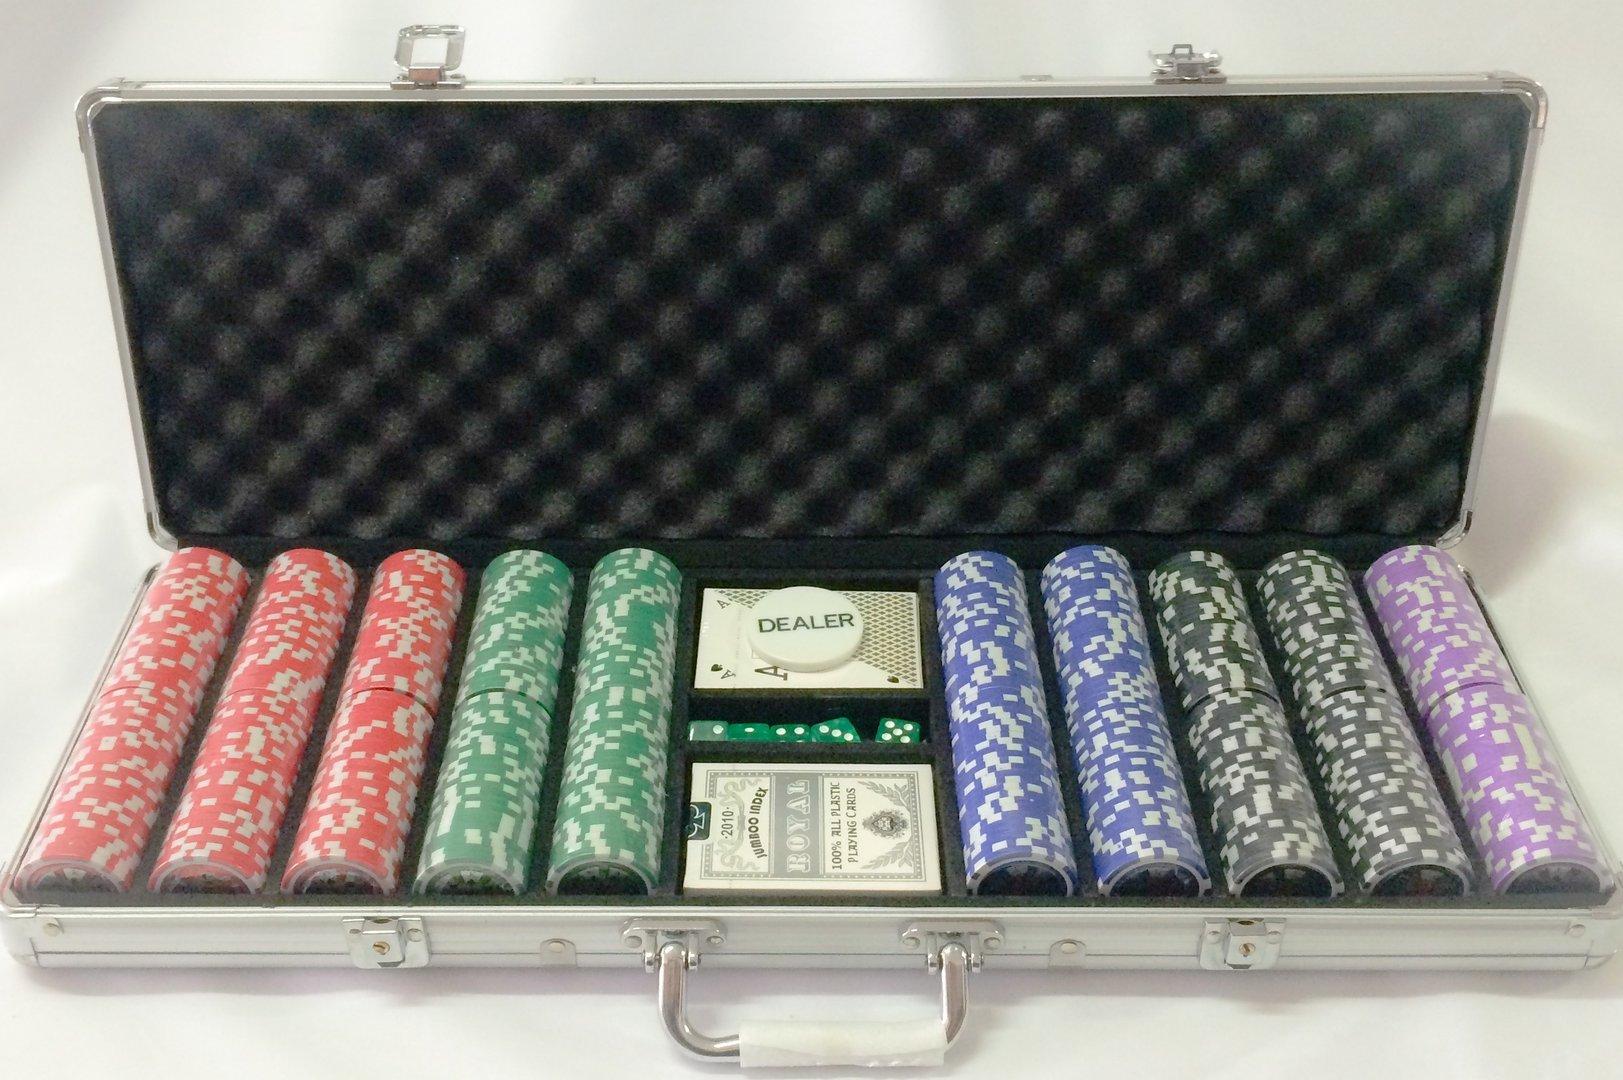 Valor de fichas de casino por color juegos Pantasia com-591614